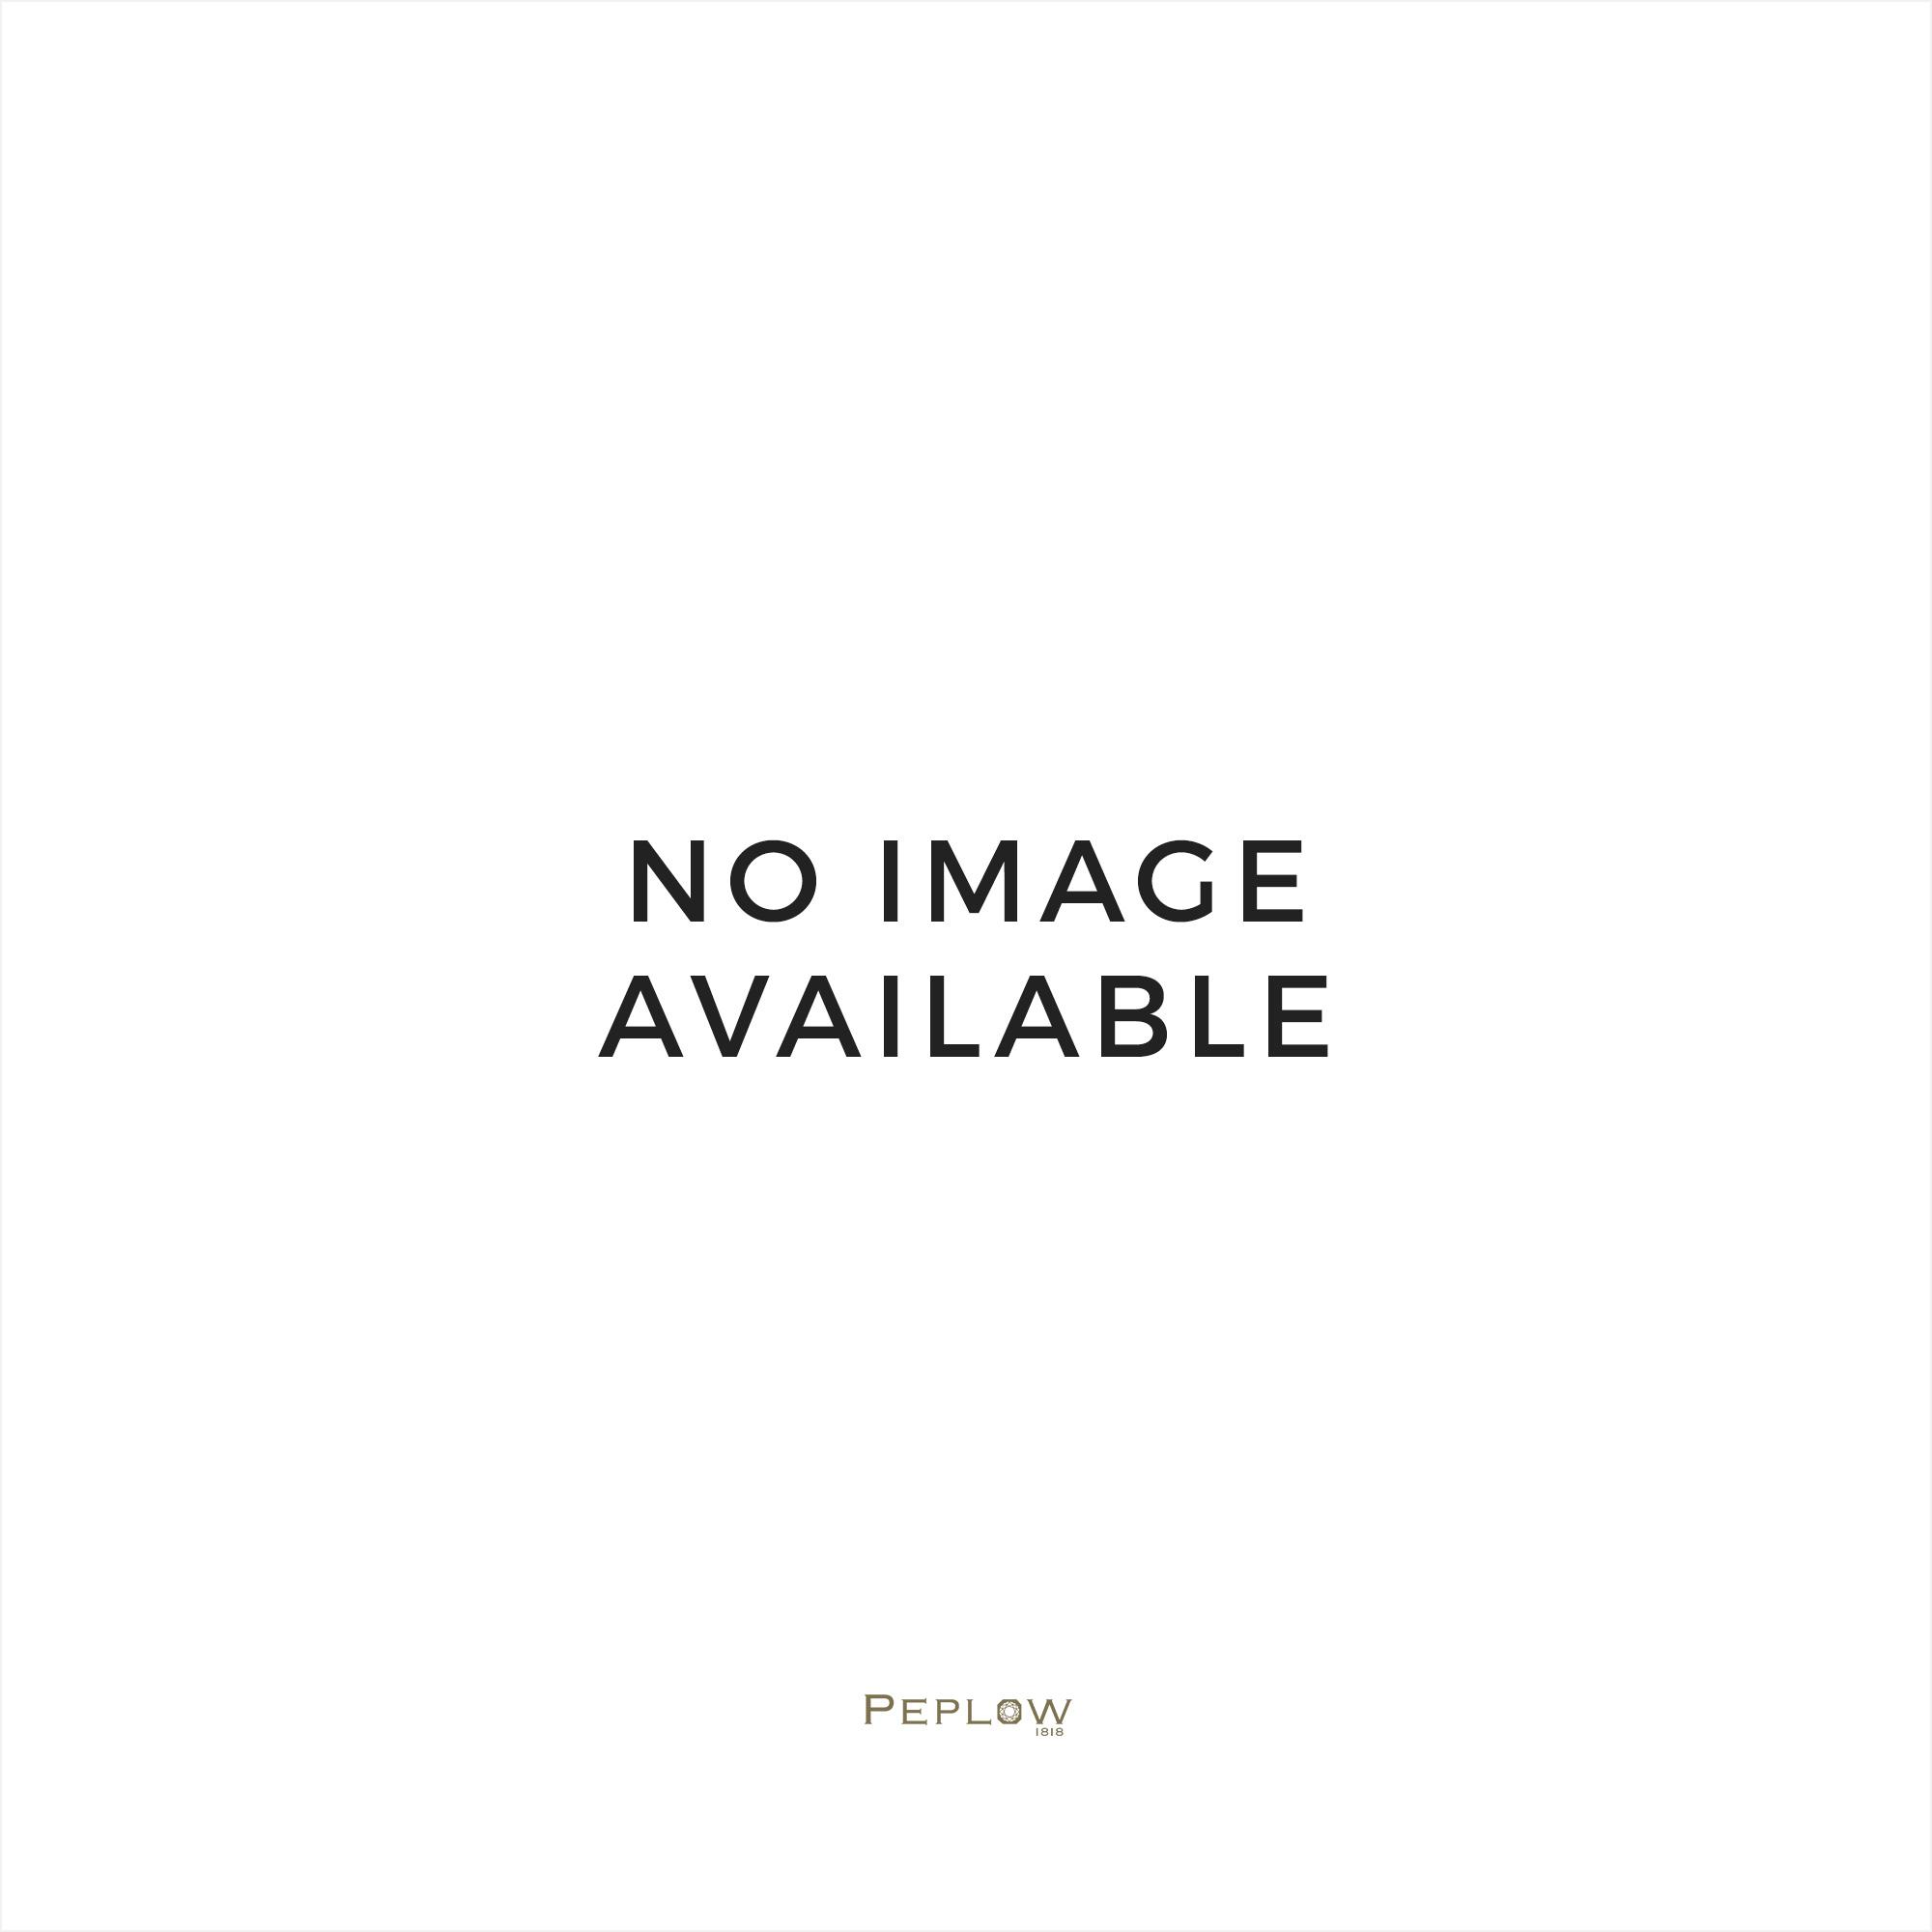 Seiko Watches Grand Seiko Gents Auto Watch